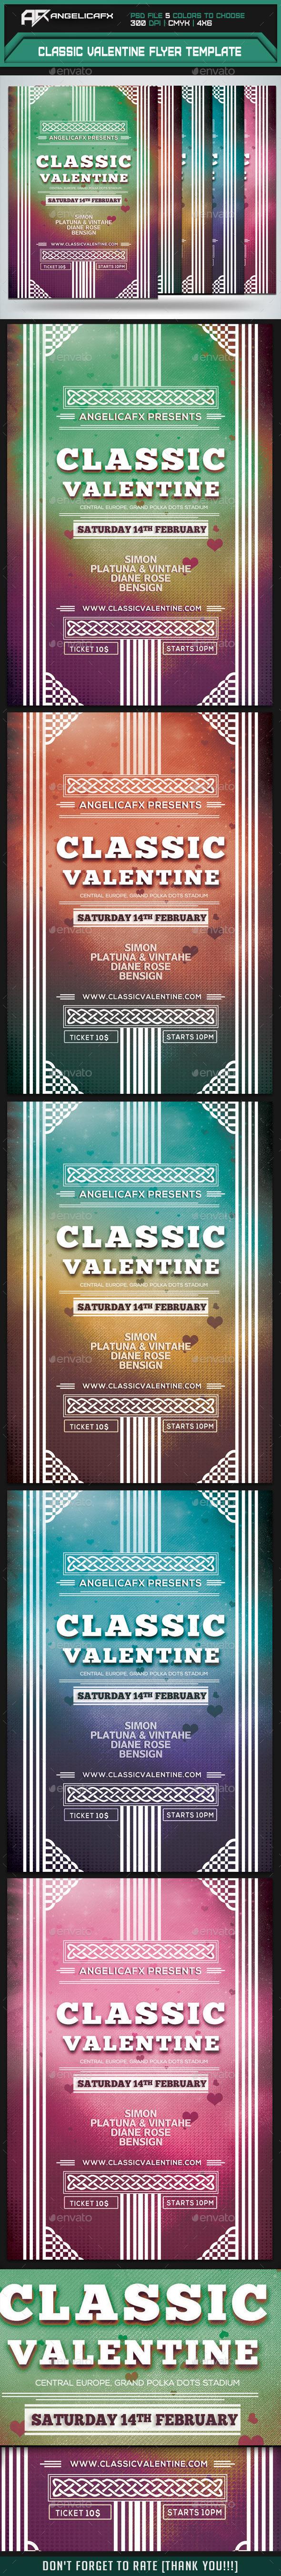 GraphicRiver Classic Valentine Flyer Template 10144730